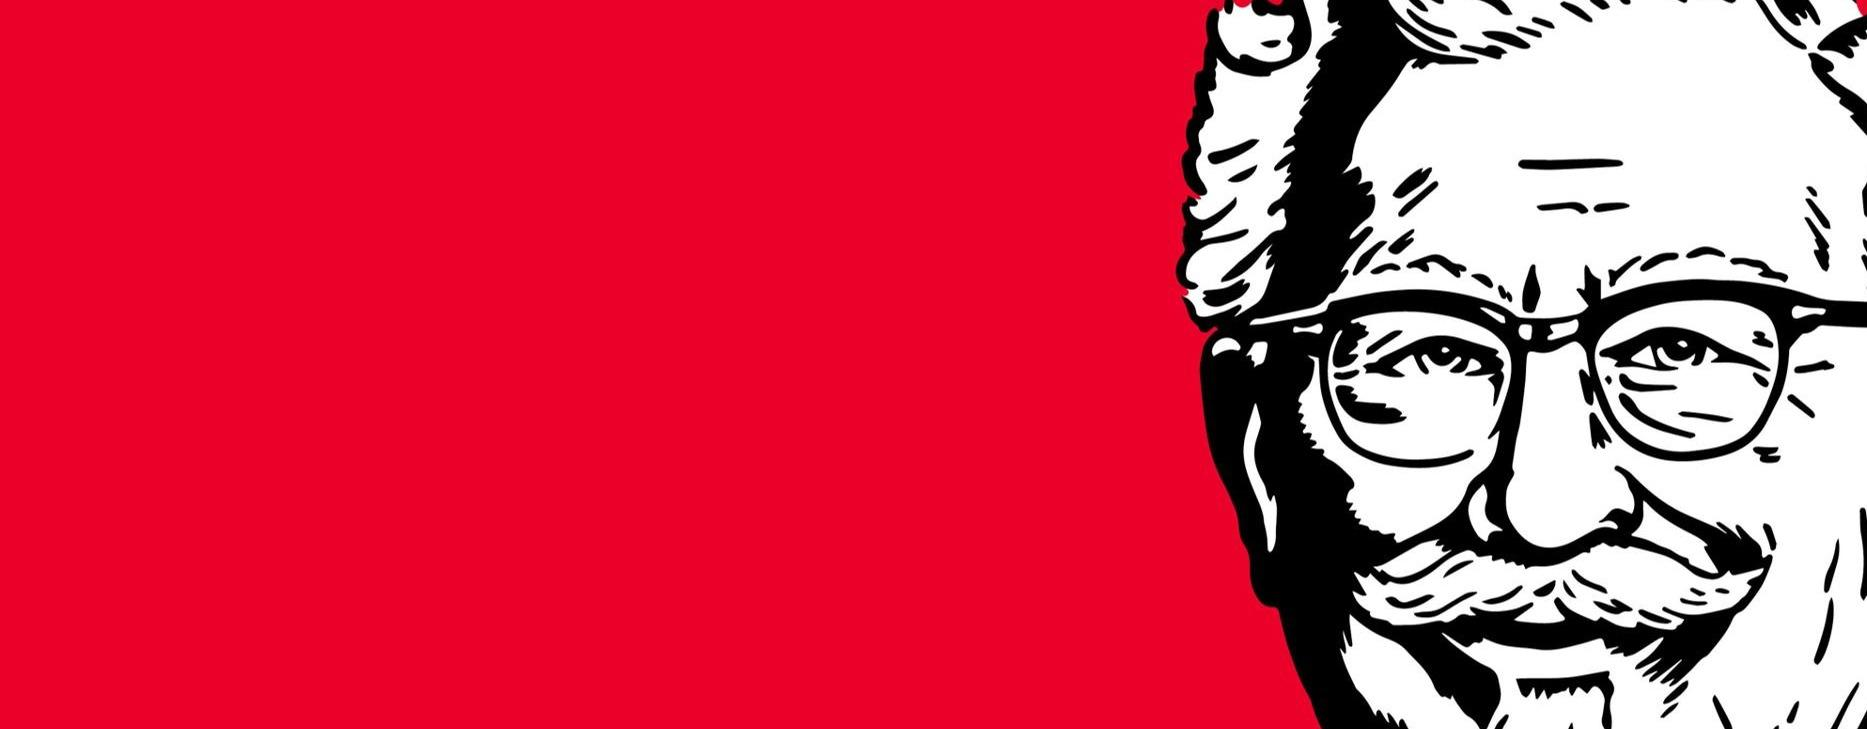 KFC UK & I - Technology Brand Cover